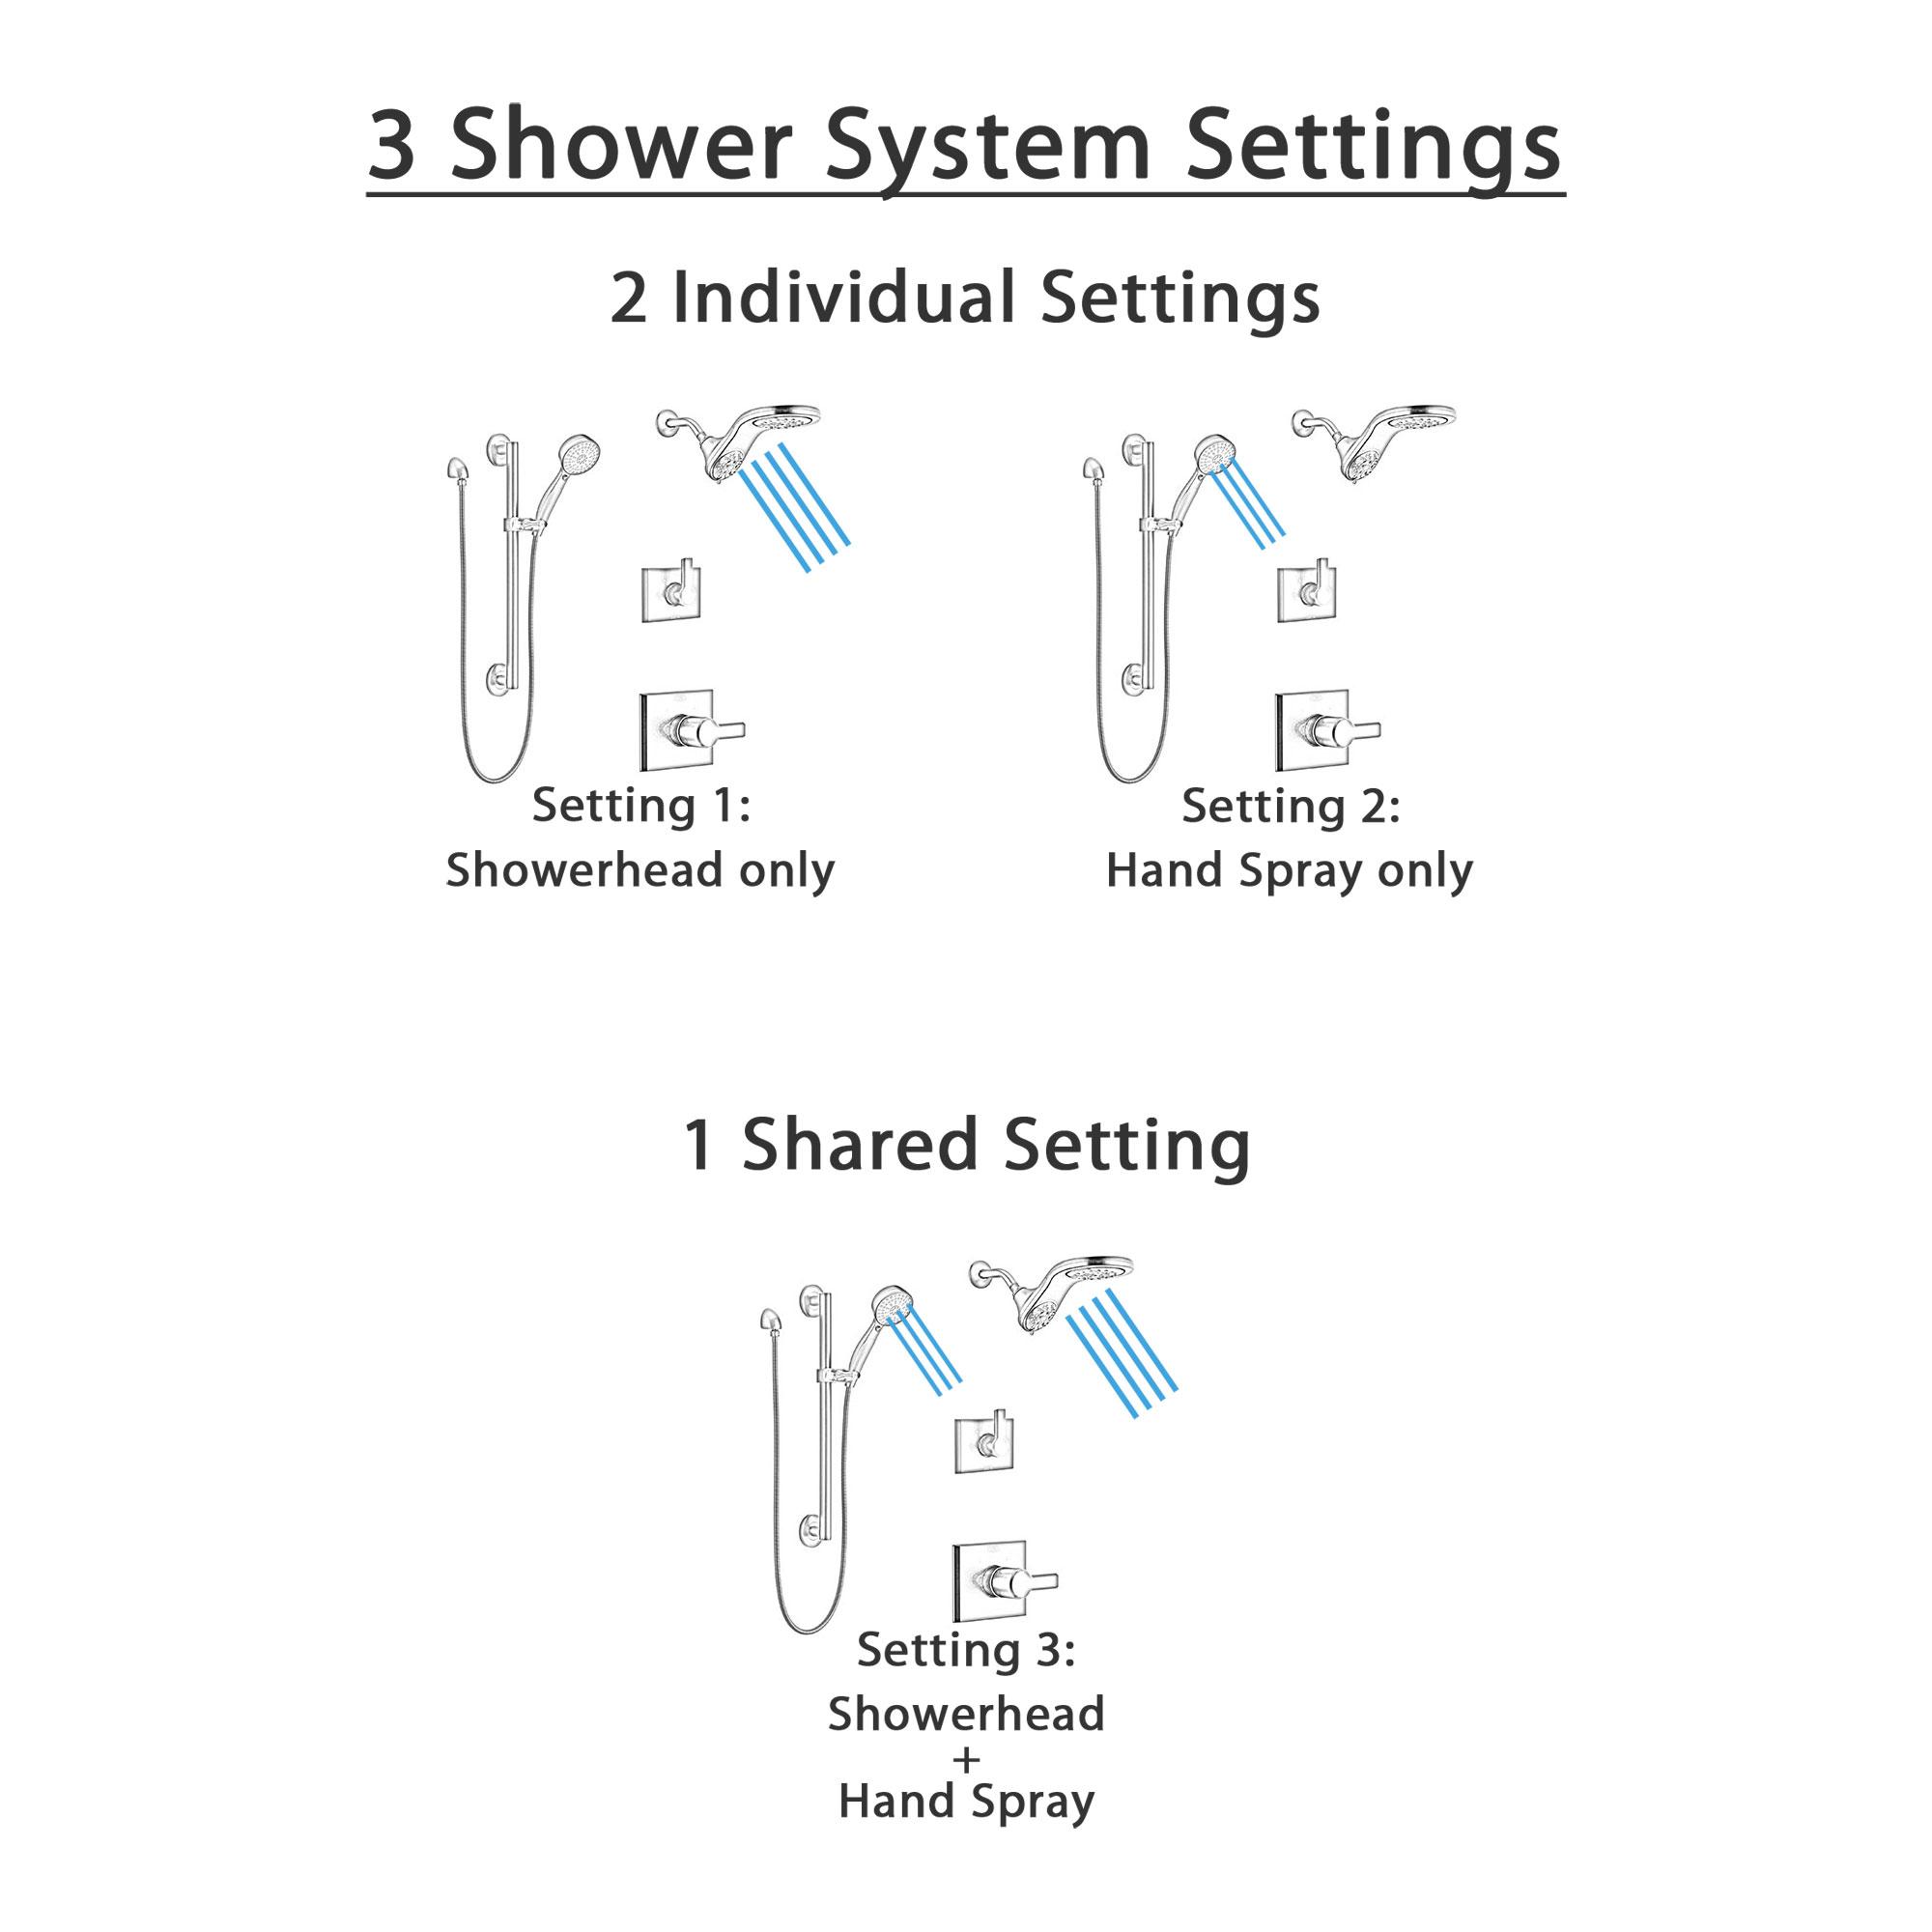 Delta Pivotal Matte Black Finish Modern Angular Shower System with Dual Showerhead HydroRain Fixture and Grab Bar Hand Sprayer Kit SS14993BL12